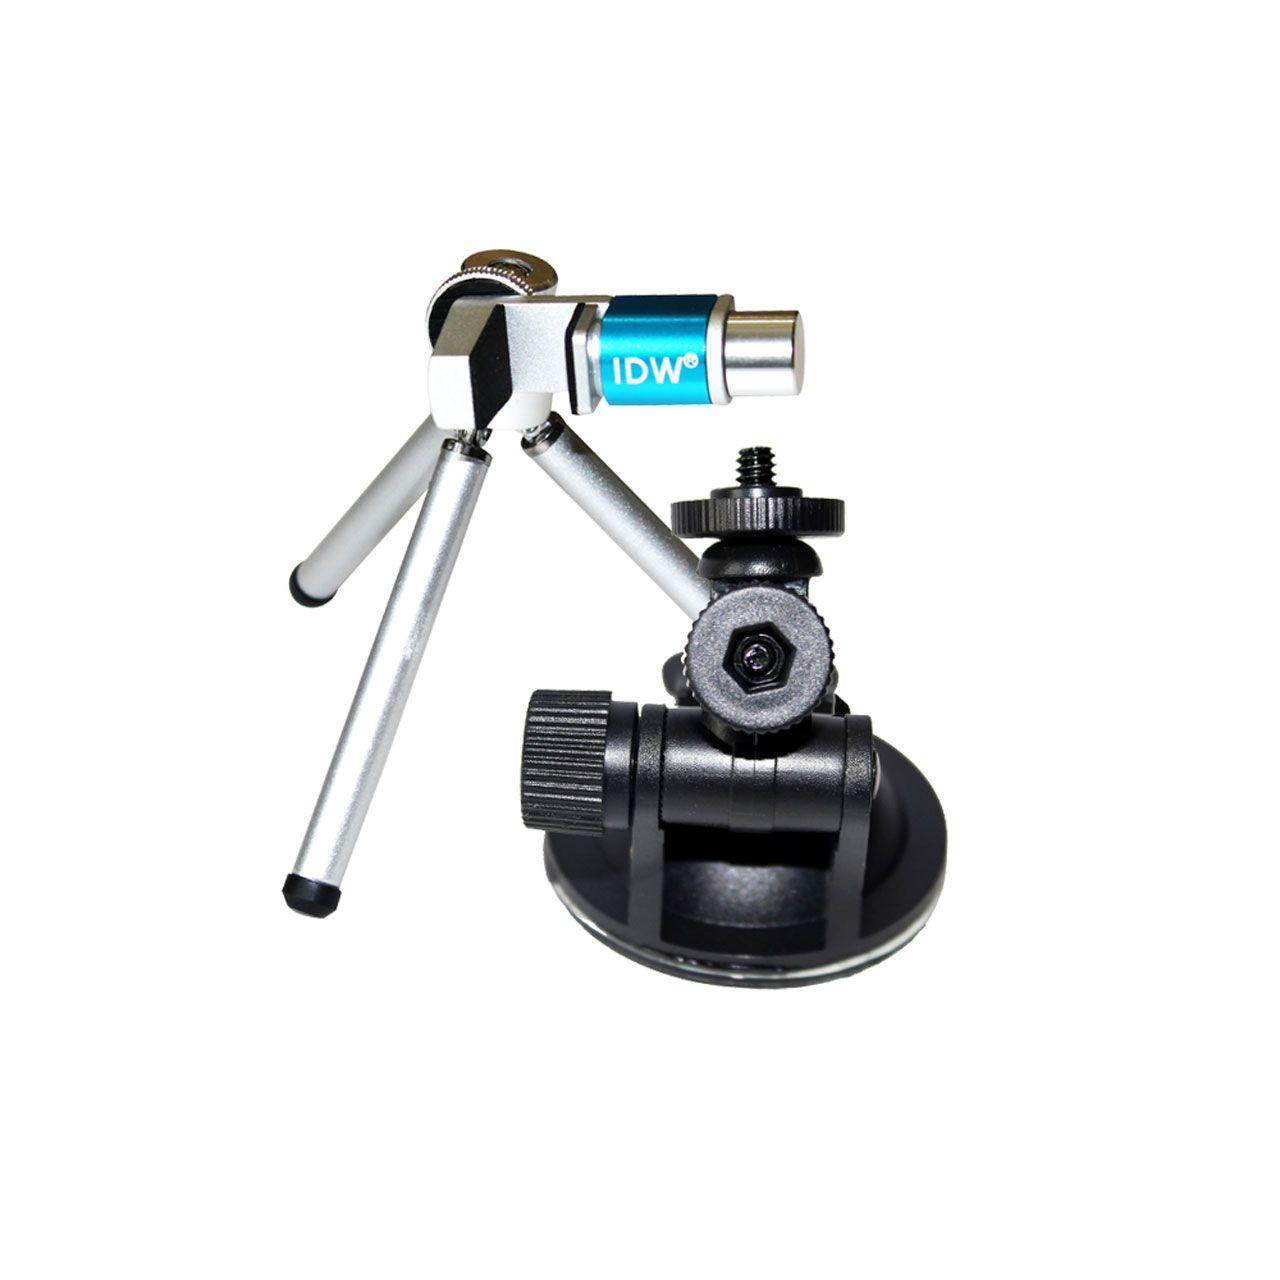 پایه نگهدارنده گوشی موبایل و تبلت آی دی دبلیو مدل Super Mount S Tripad Blue / SP-F-BS-T main 1 1